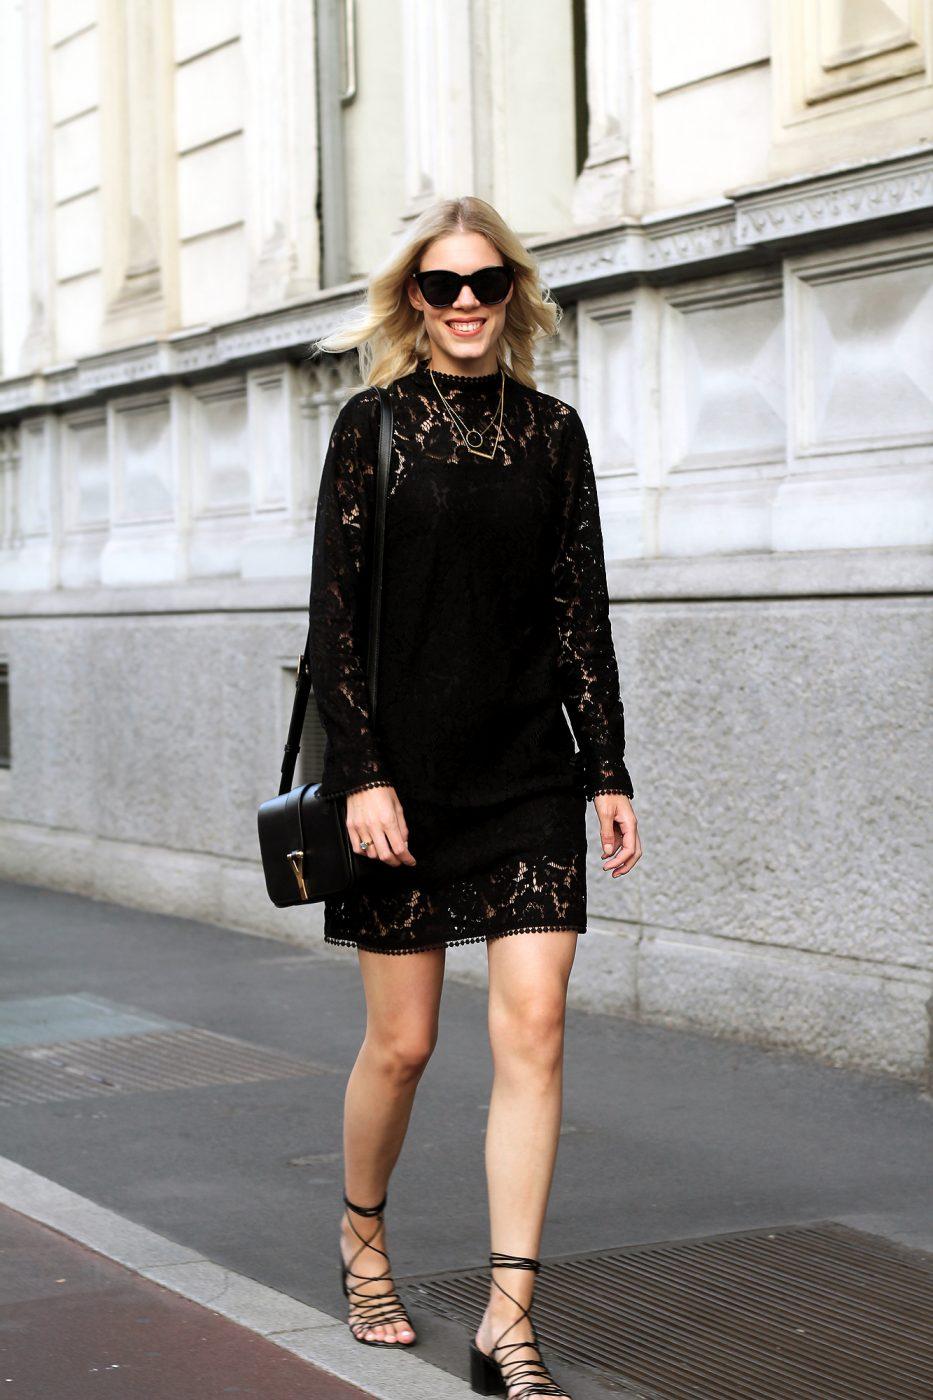 hm_spitzekleid_somehappyshoes_milan_fashionweek